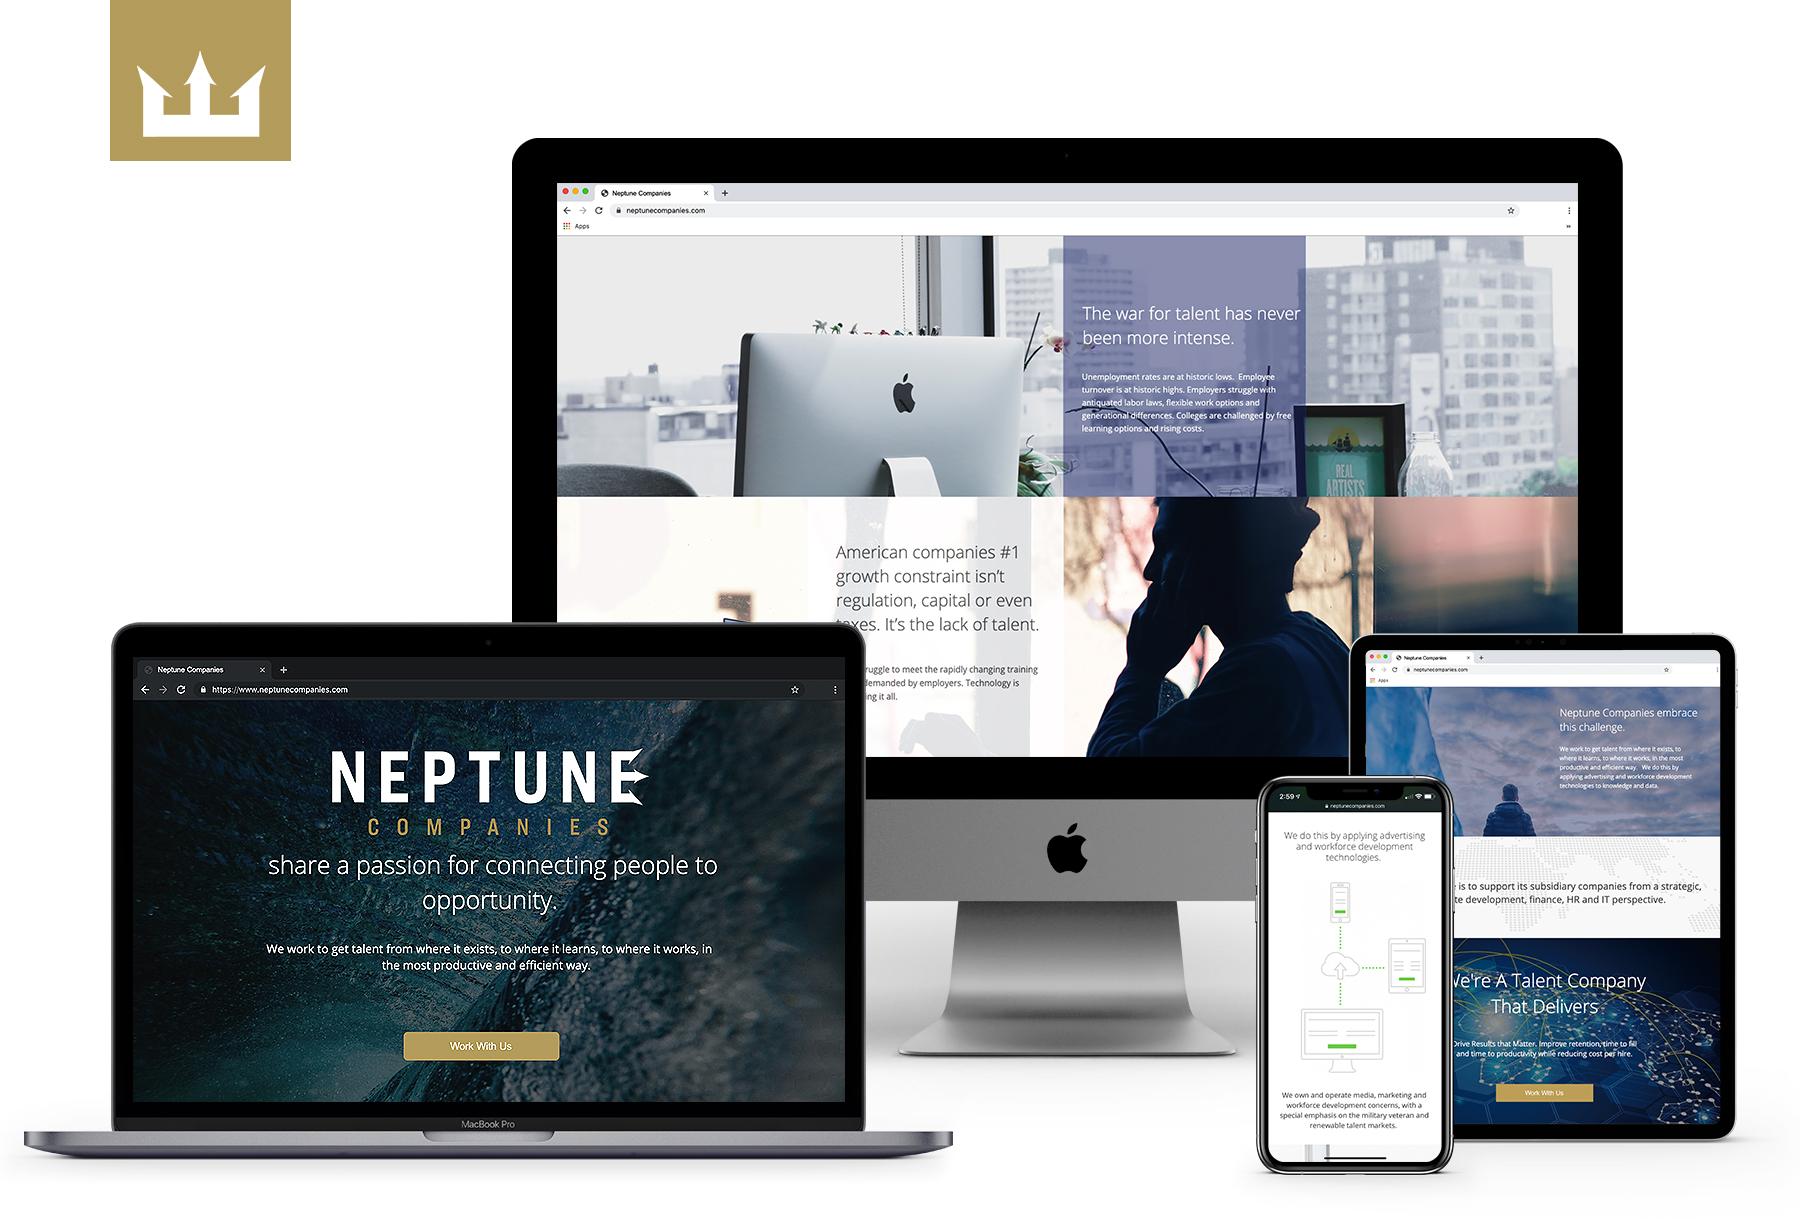 Neptune Companies' Website